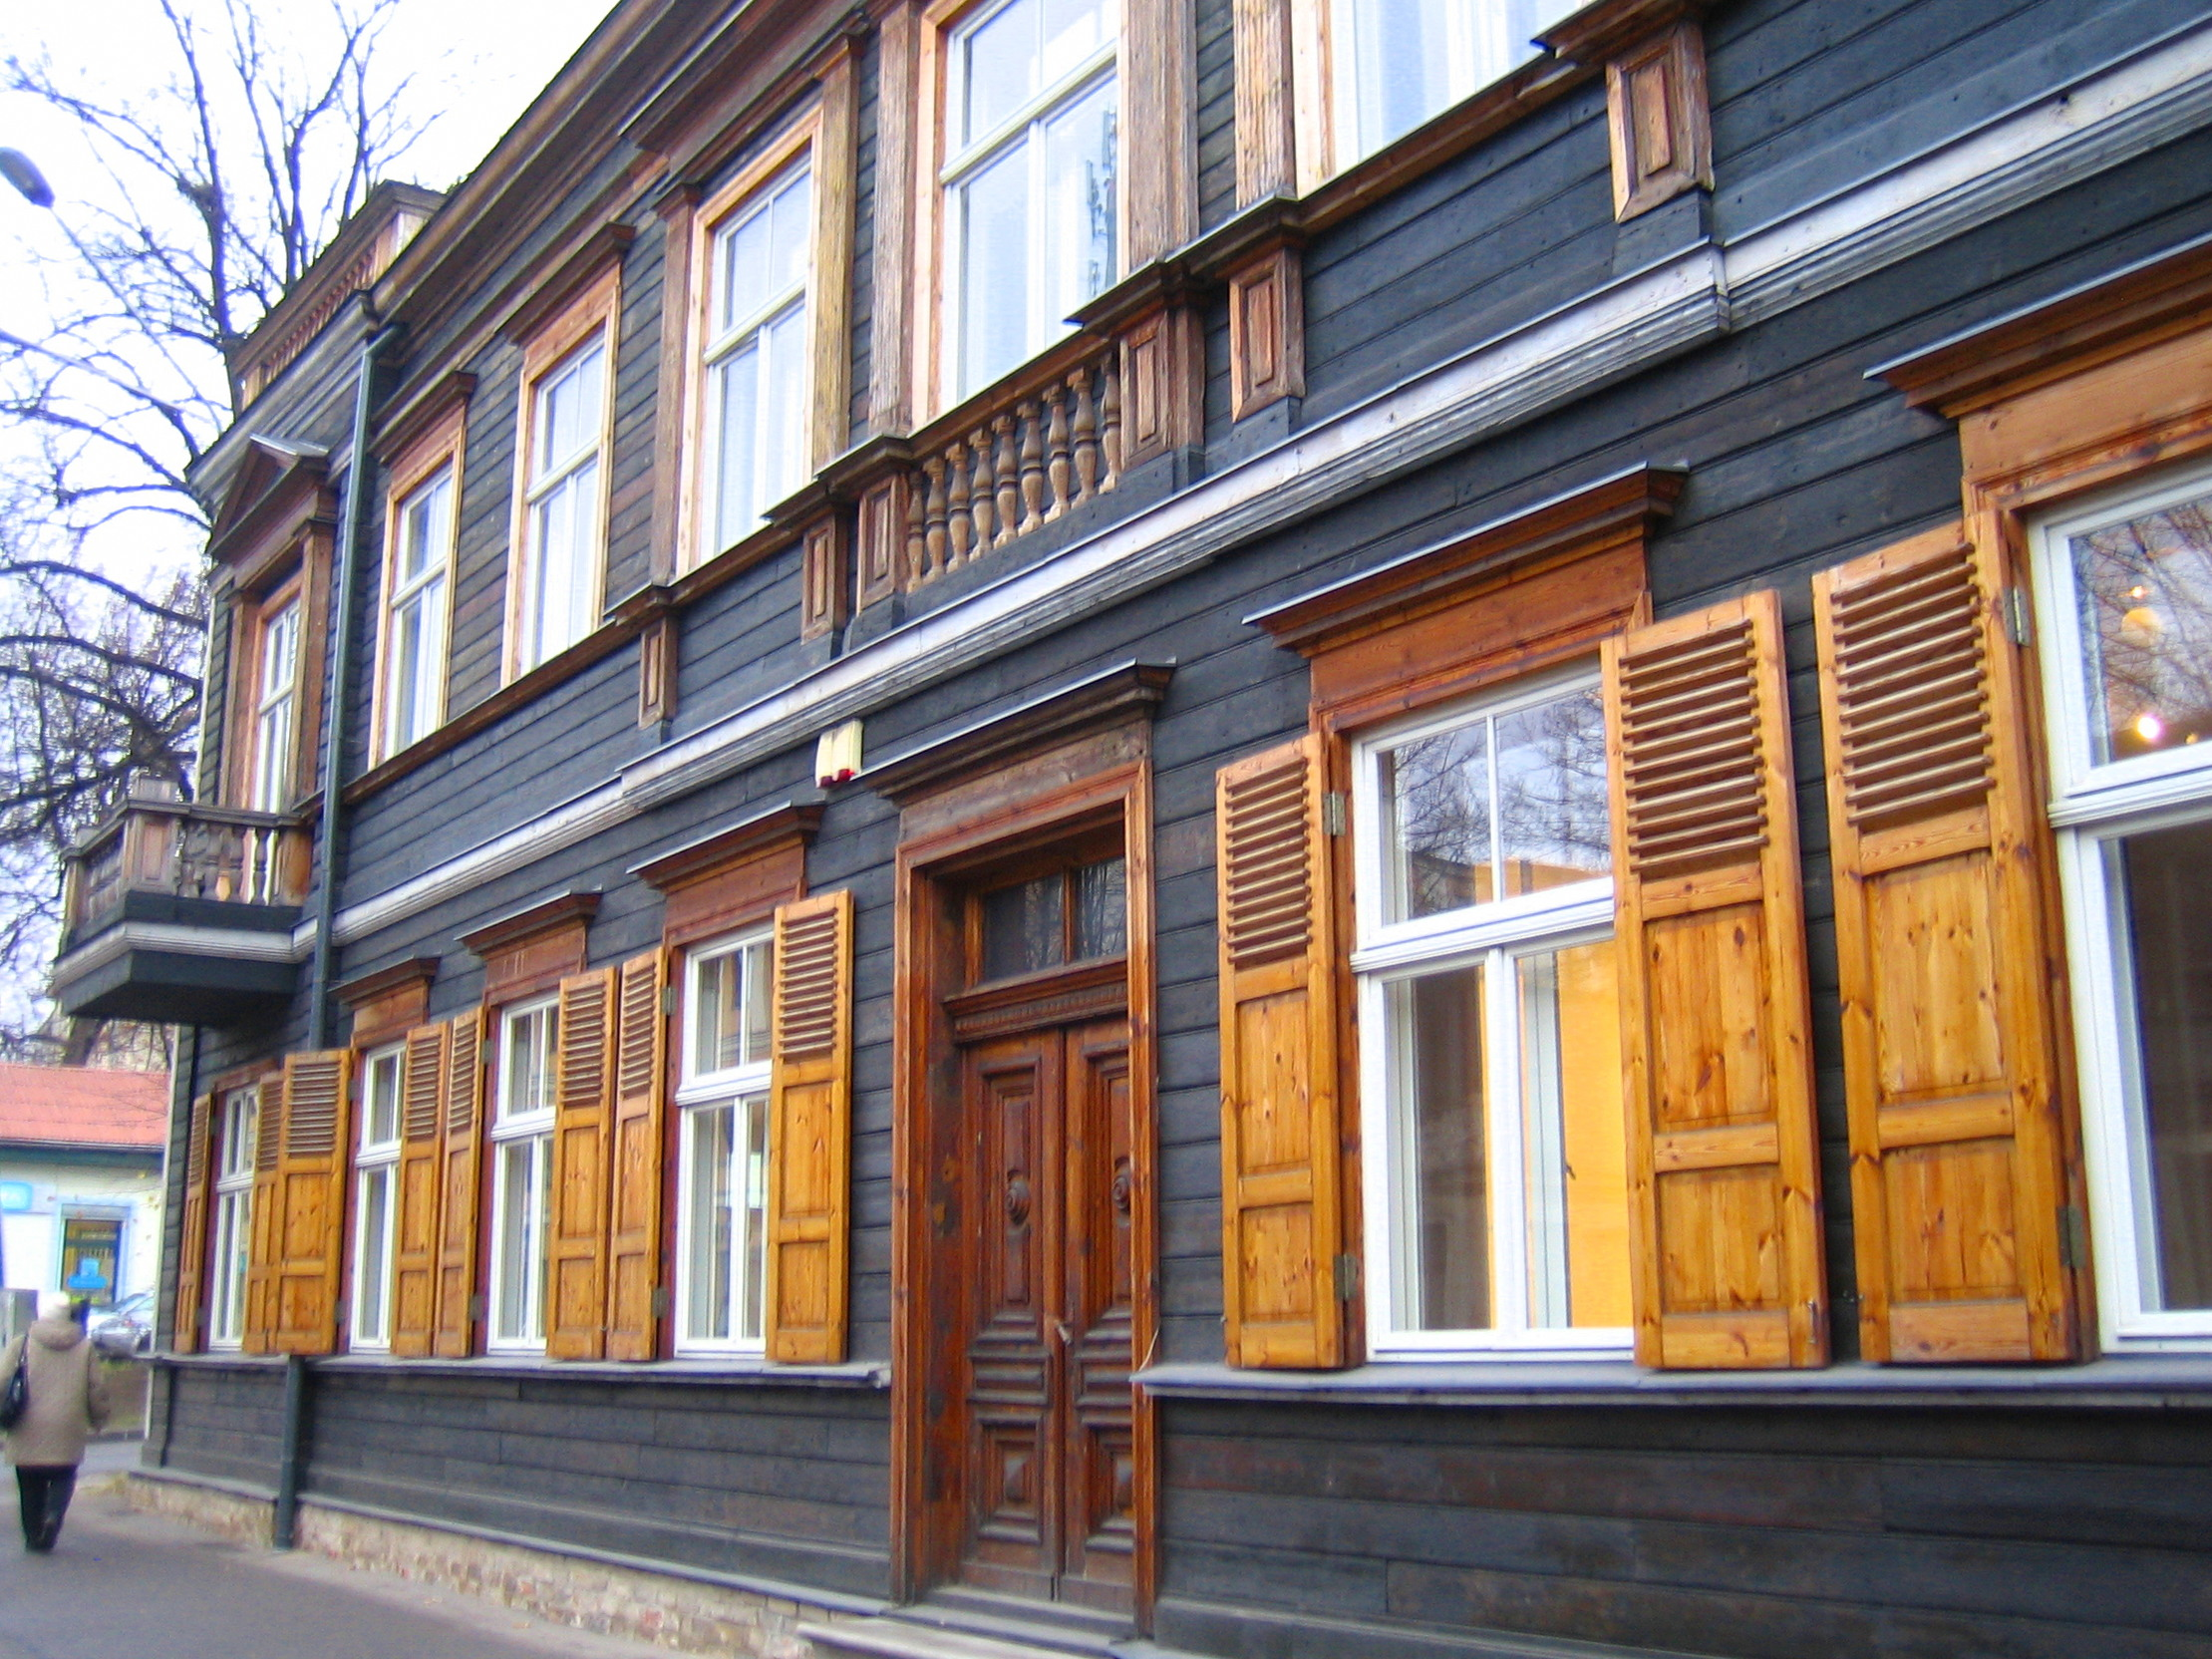 Grand immeuble rénové en bois (Riga)